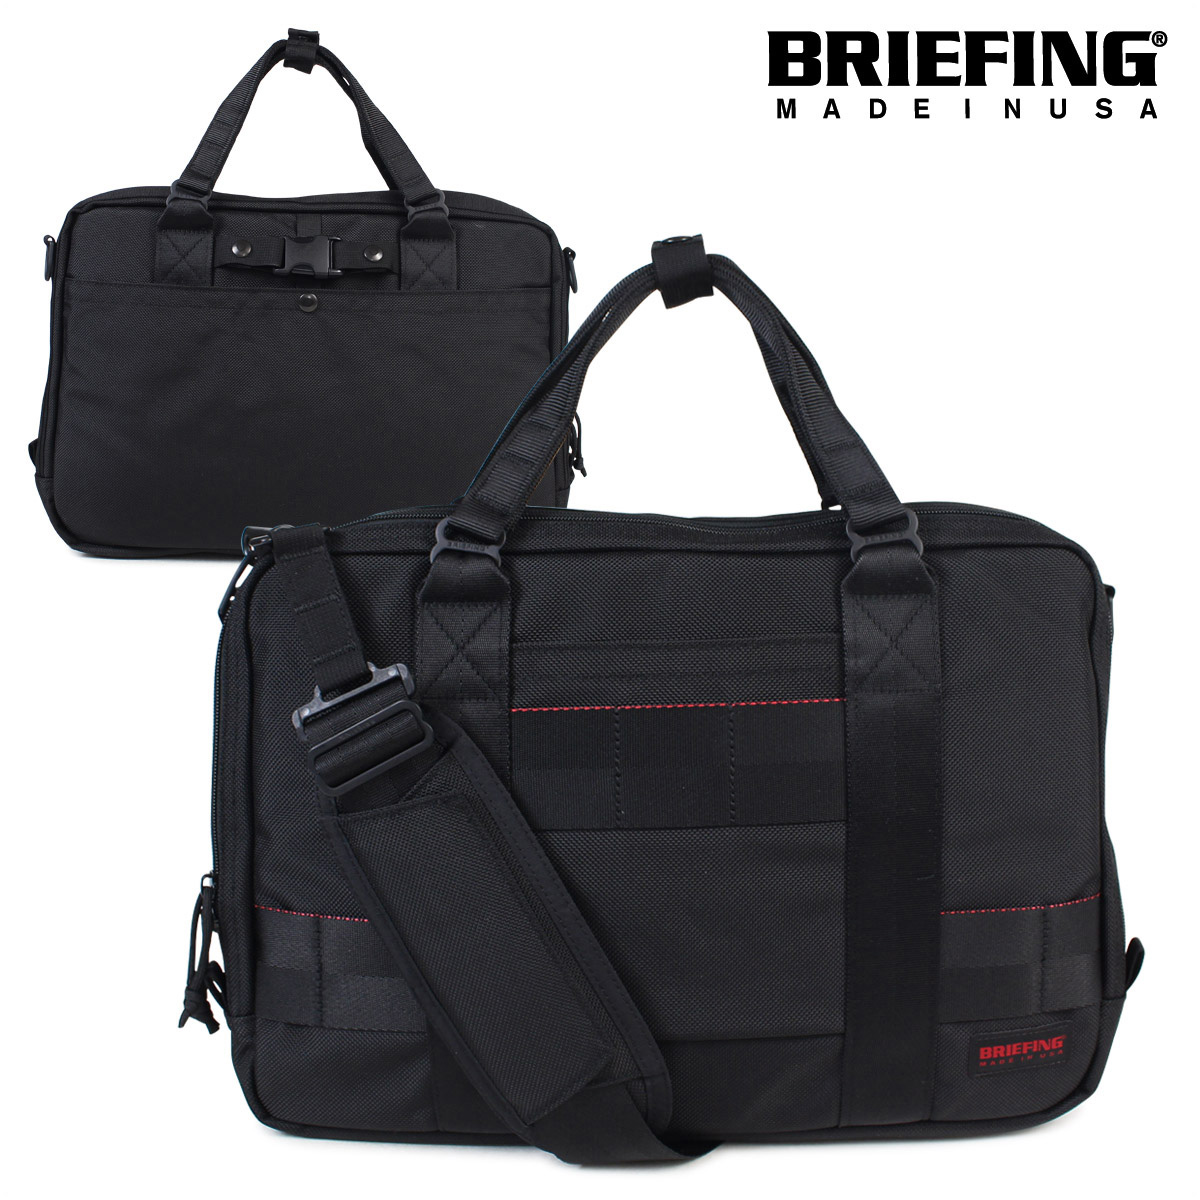 BRIEFING ブリーフィング バッグ 3way ブリーフケース リュック ビジネスバッグ メンズ SSL LINER A4 ブラック 黒 BRF489219 [3/11 再入荷]